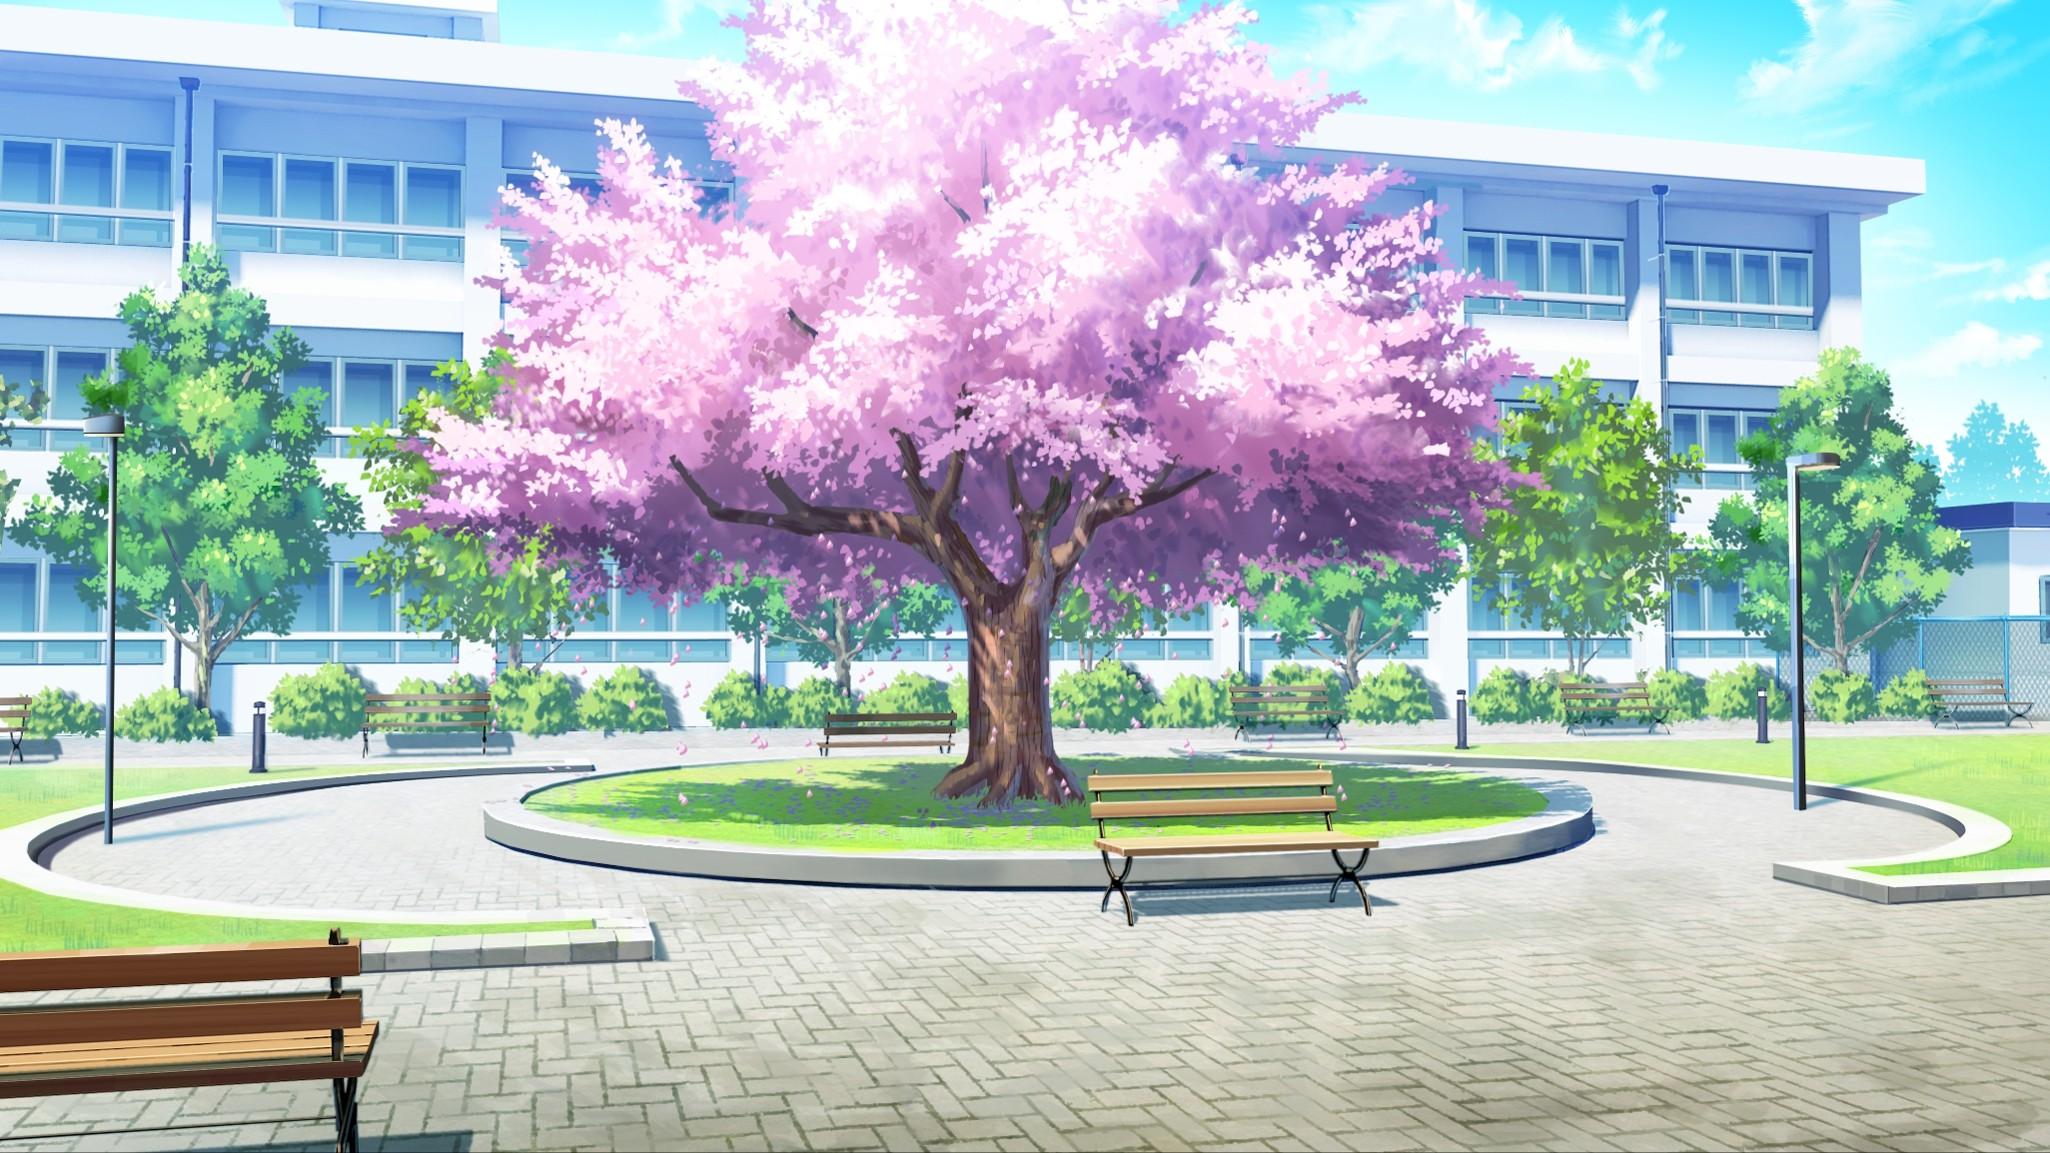 Image Result For Manga Anime Iphone Wallpapera